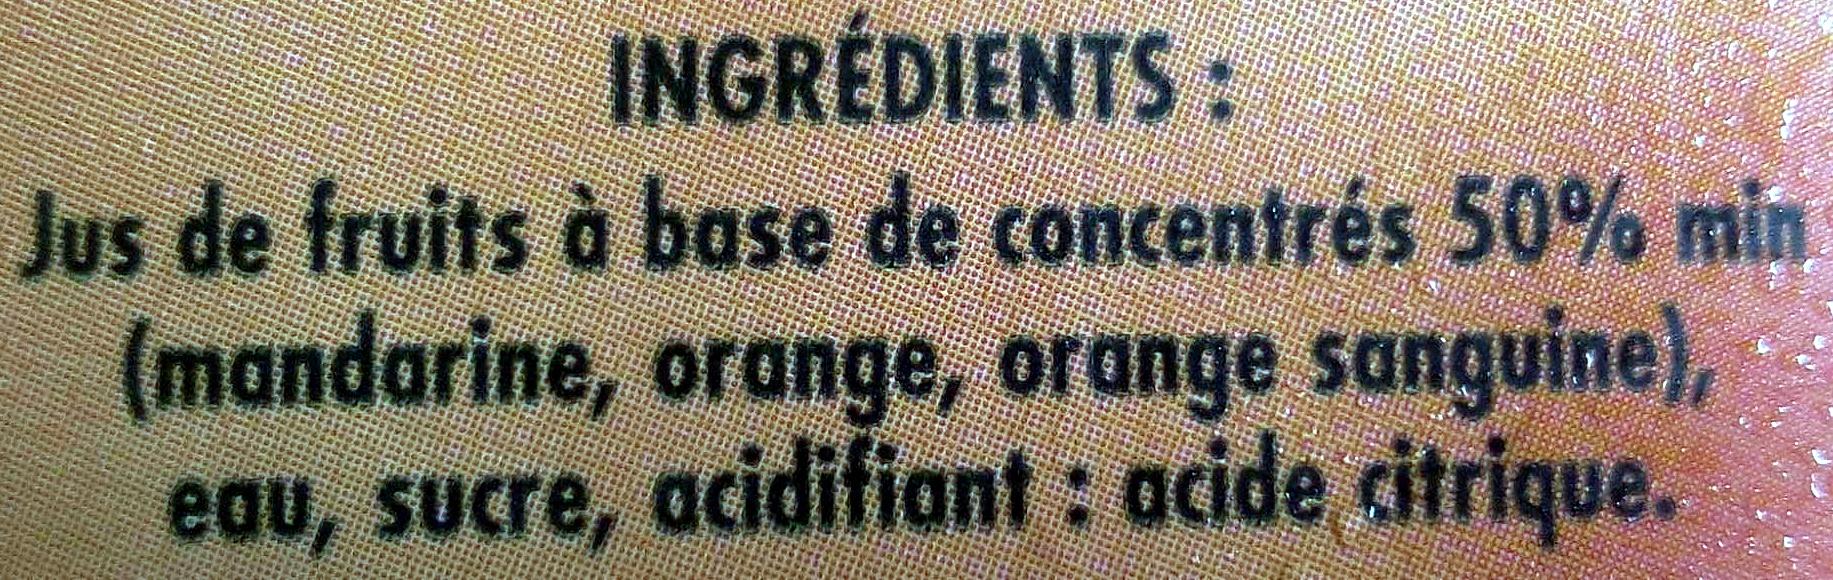 Nectar Oranges Mandarine - Ingrédients